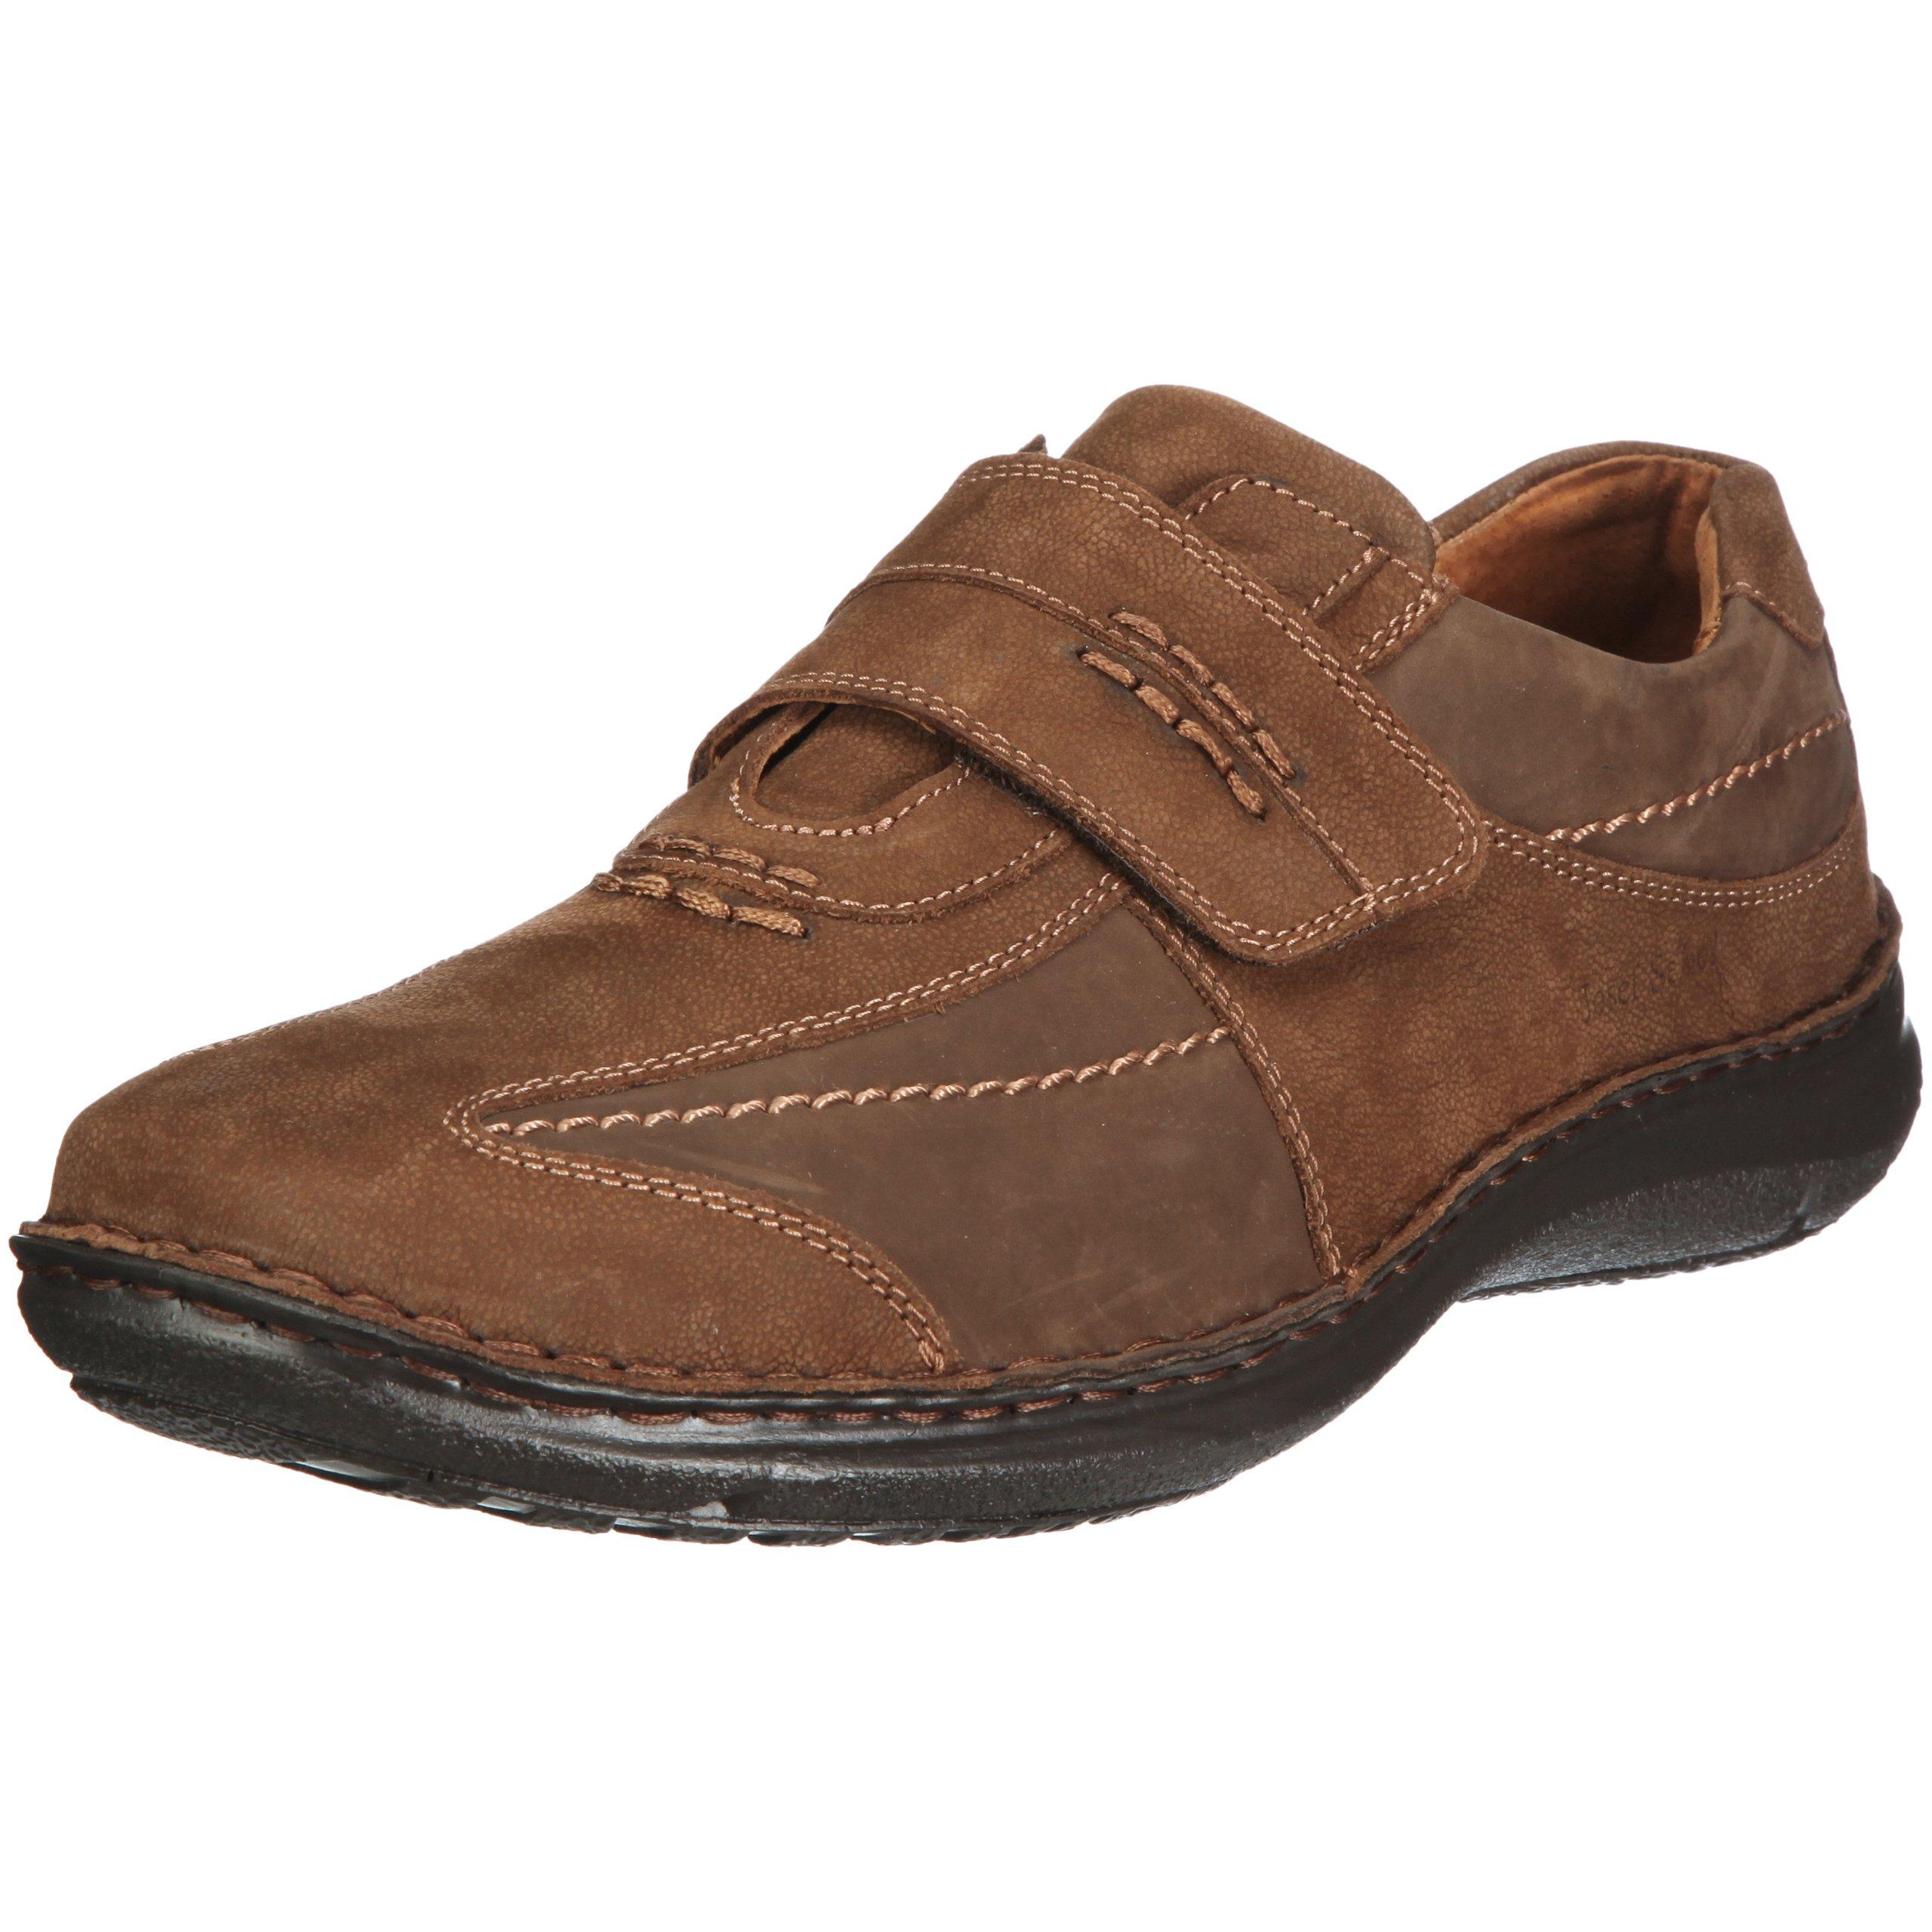 Josef Brasil45 340 Gmbh AlecMocassins Schuhfabrik Seibel Eu HommeMarron921 b76ygYf